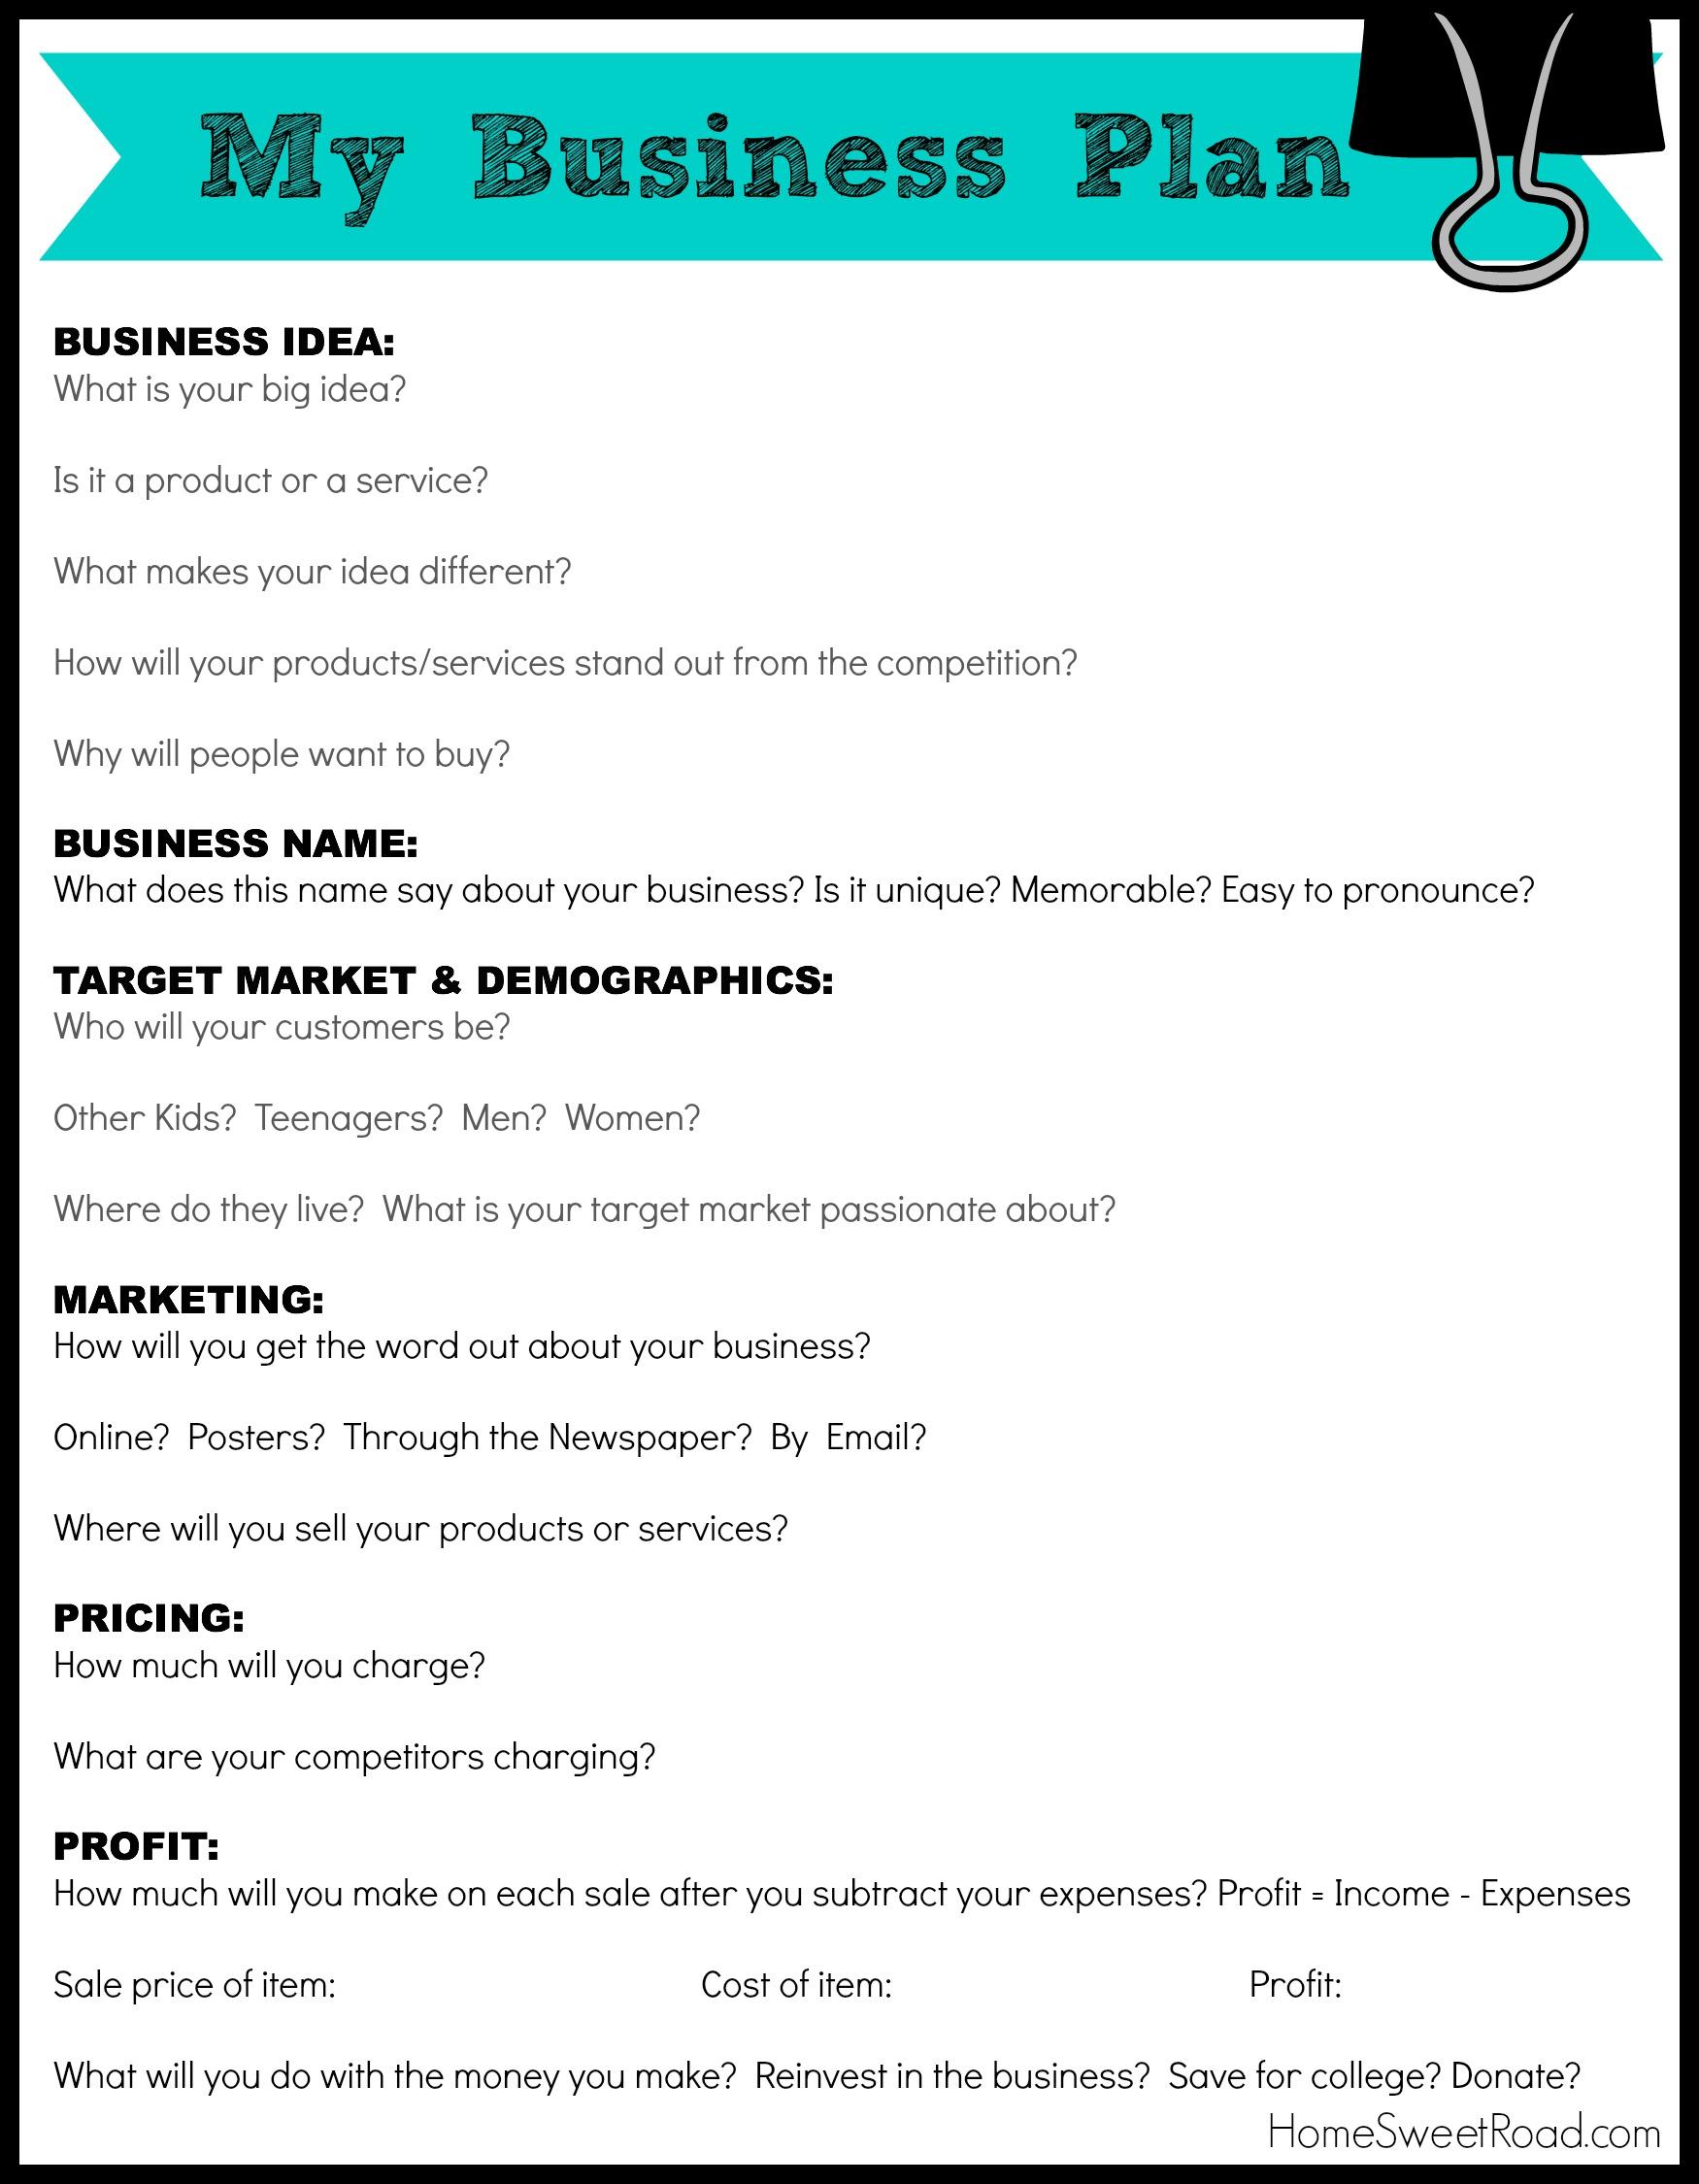 Write my business plan